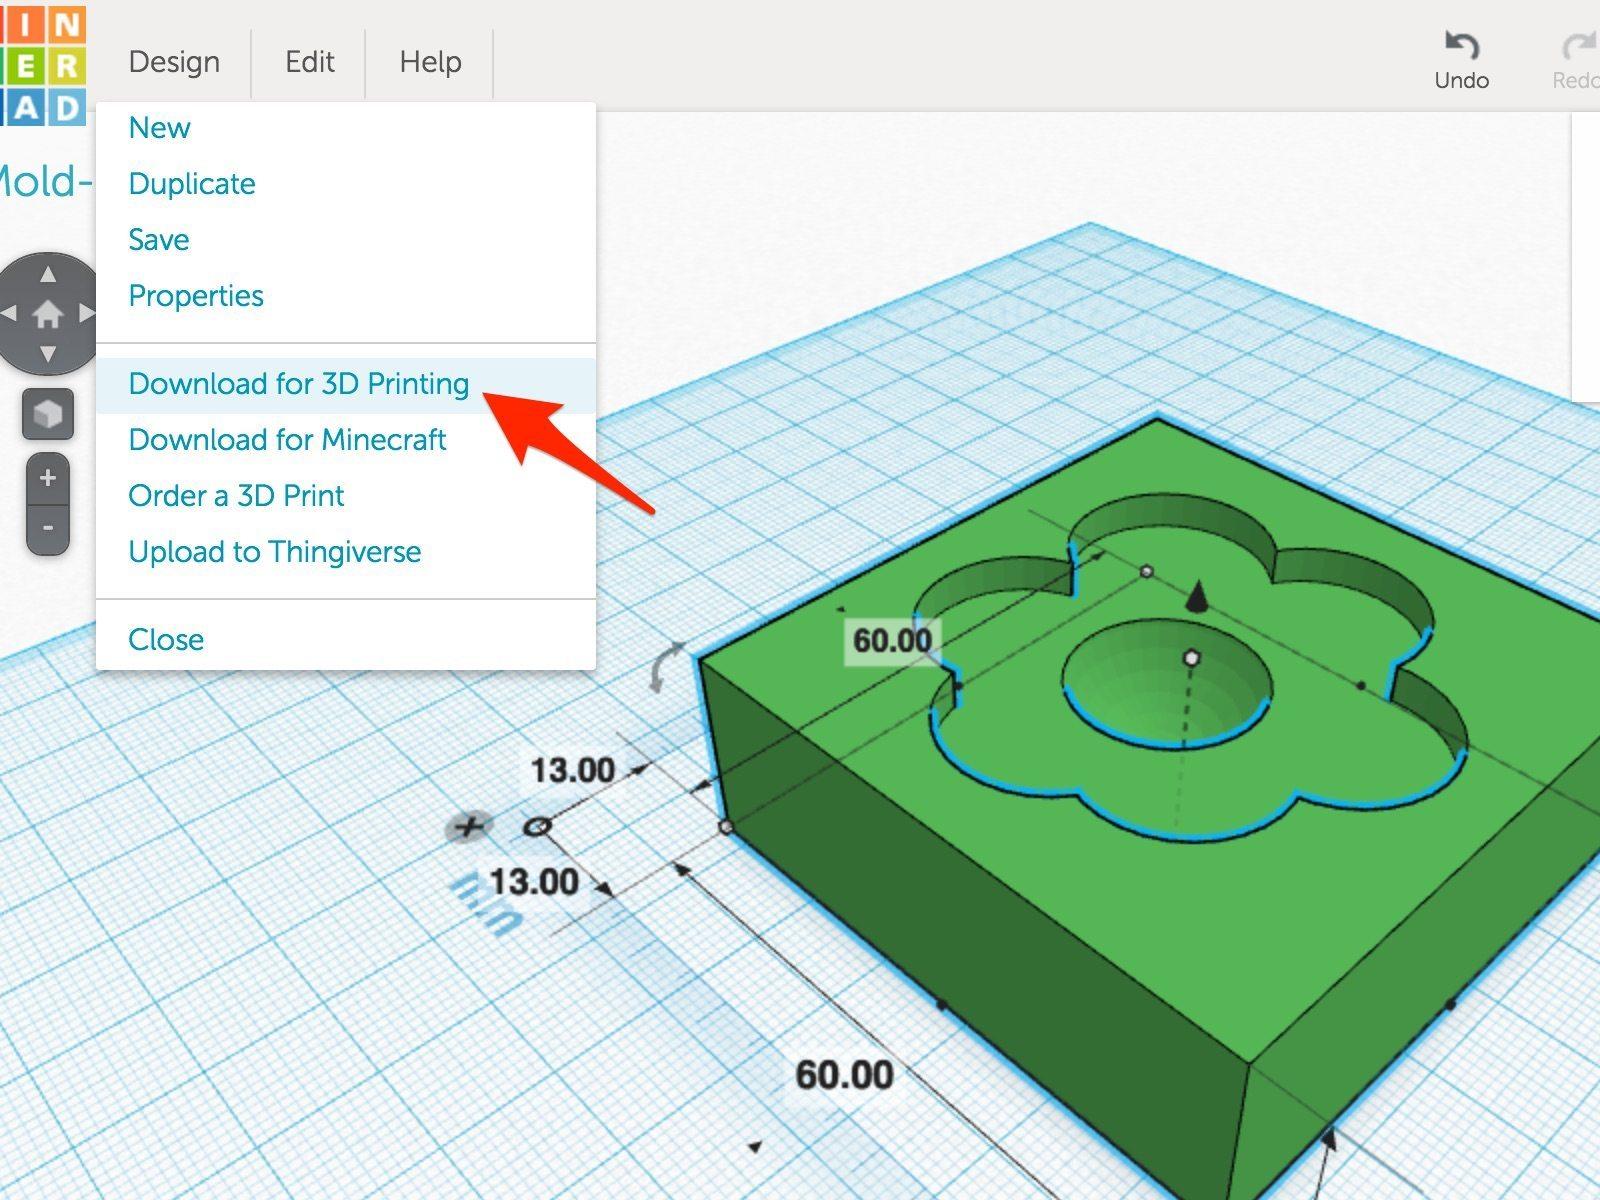 Pt 1 Step 14 - Download for 3D printing